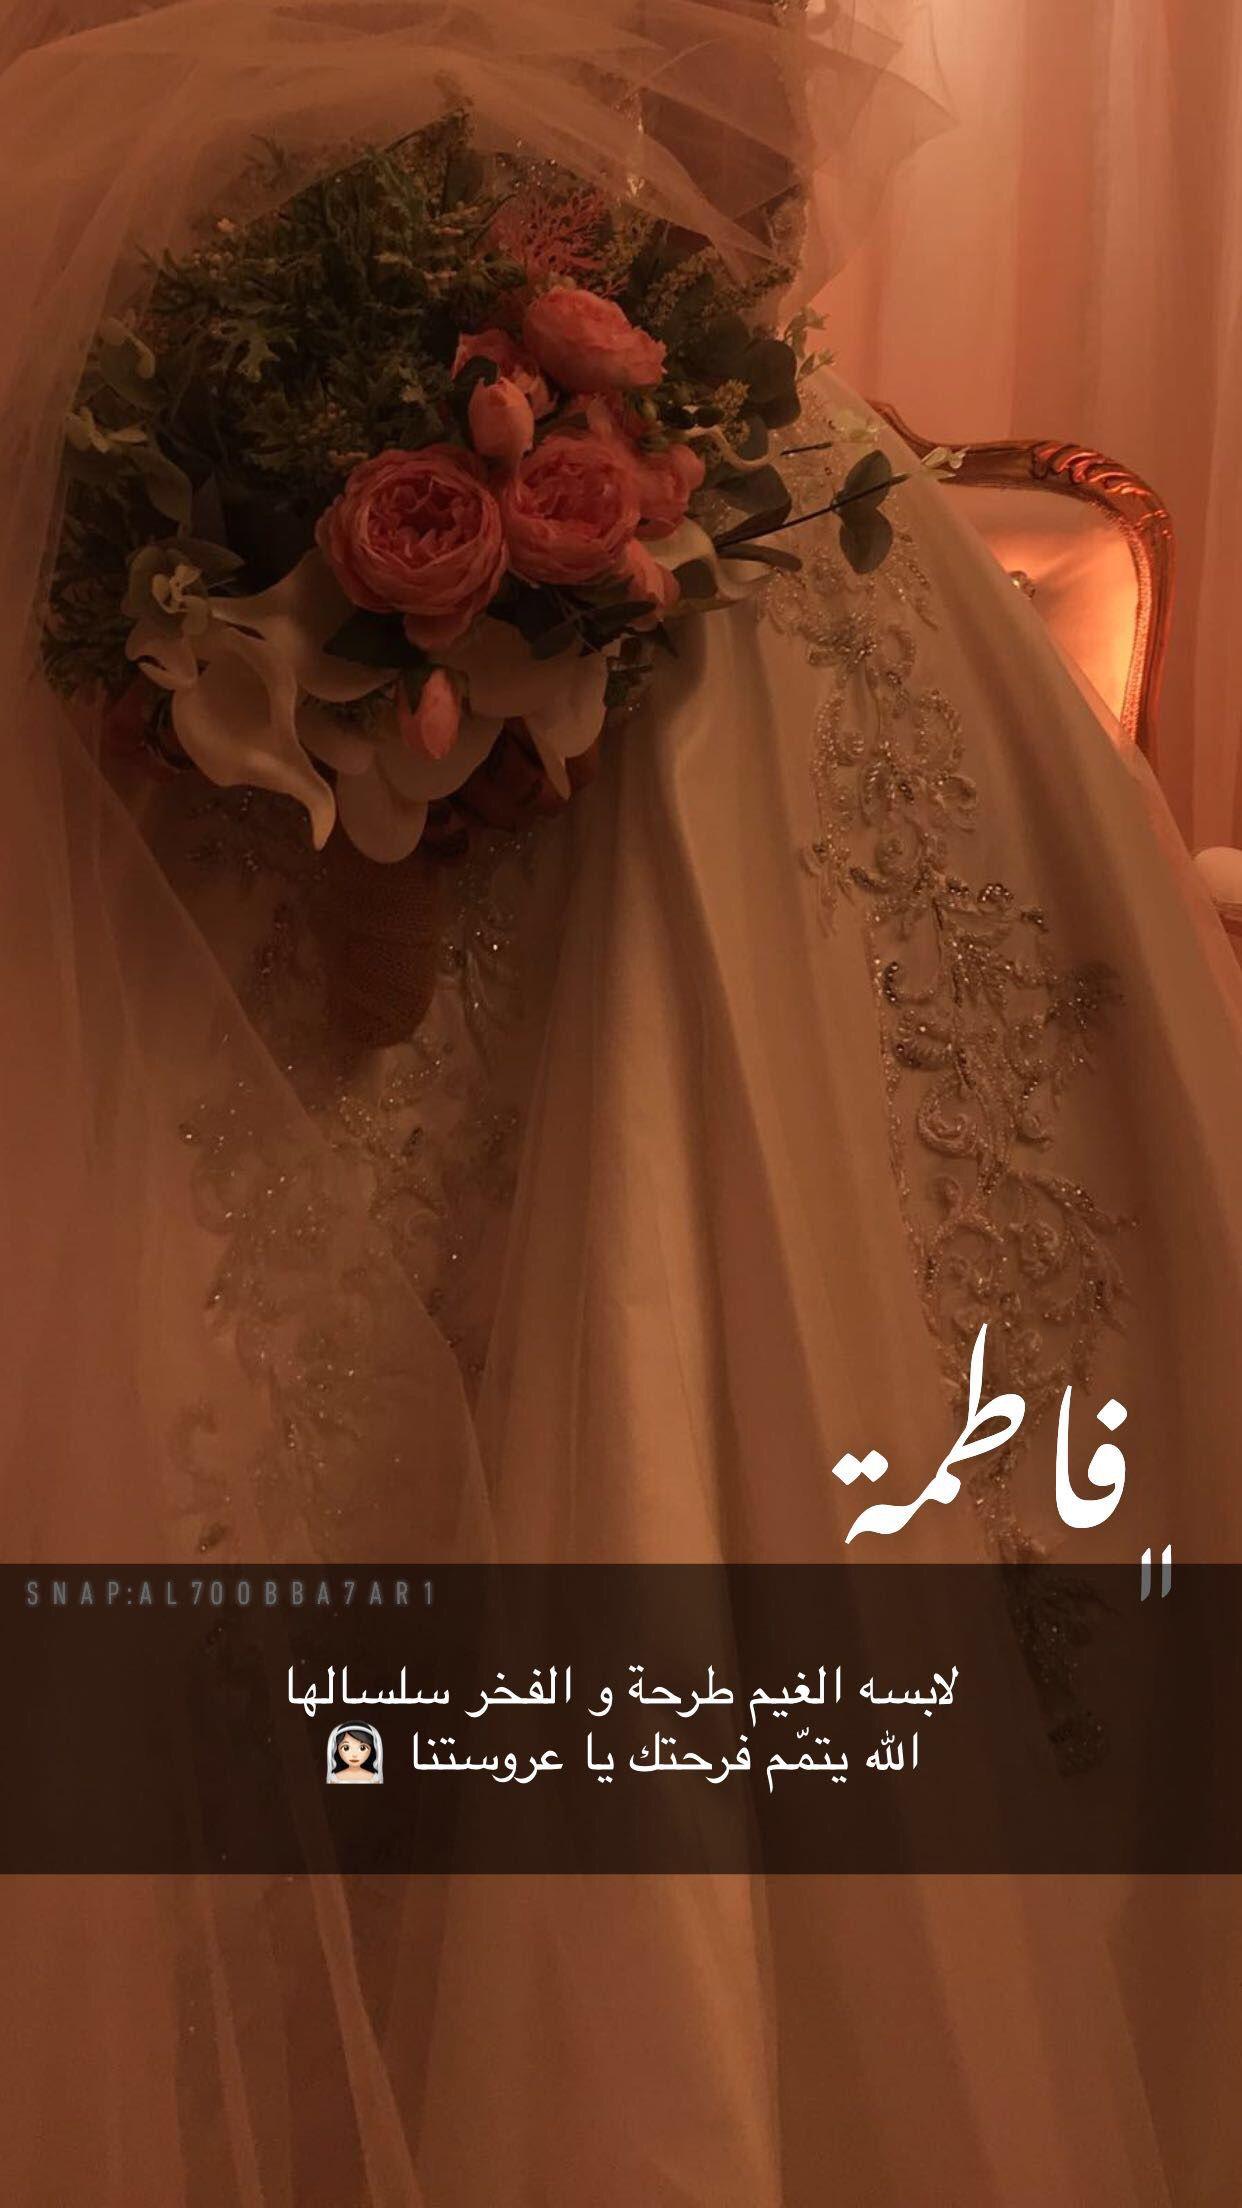 Telegram Contact Live Khadijah Flower Girl Dresses Brides Wedding Dress Instagram Photo Ideas Posts